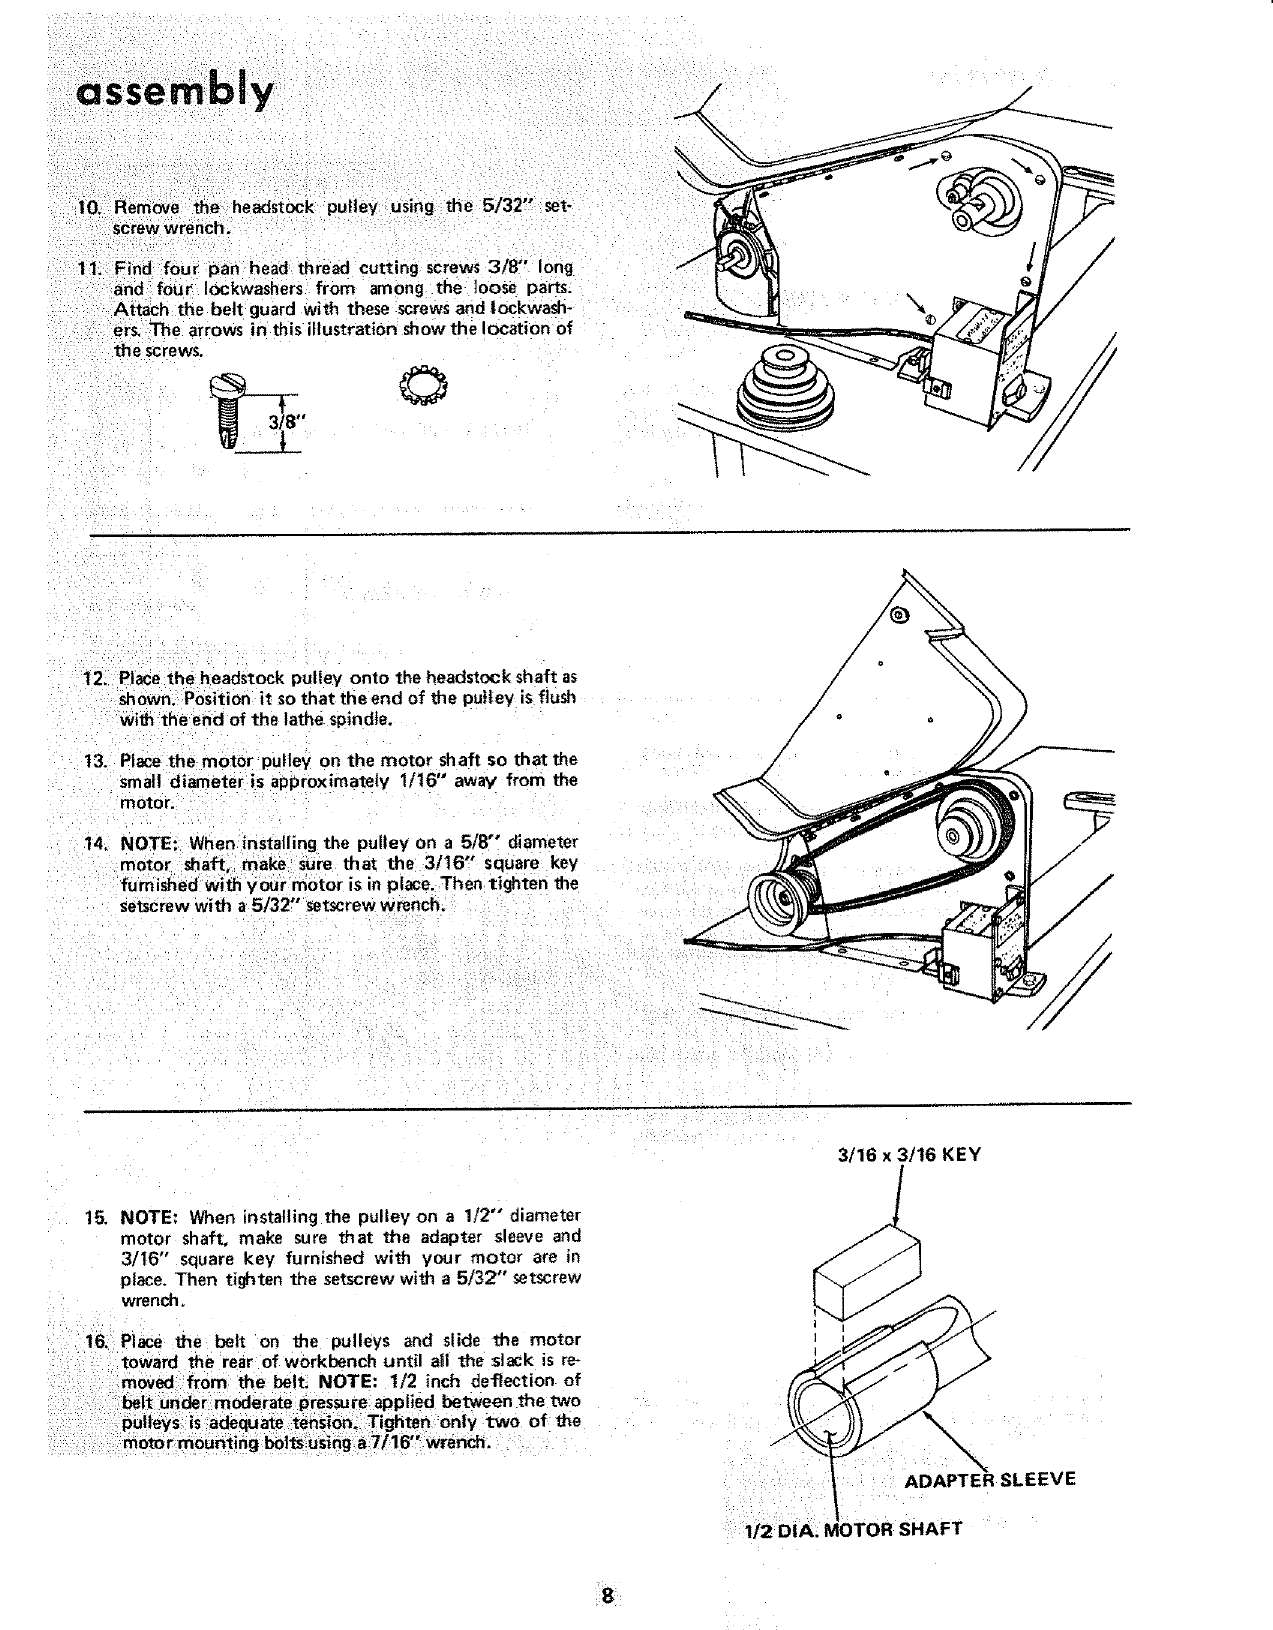 Craftsman 113228000 User Manual 12 WOOD TURNING LATHE Manuals And